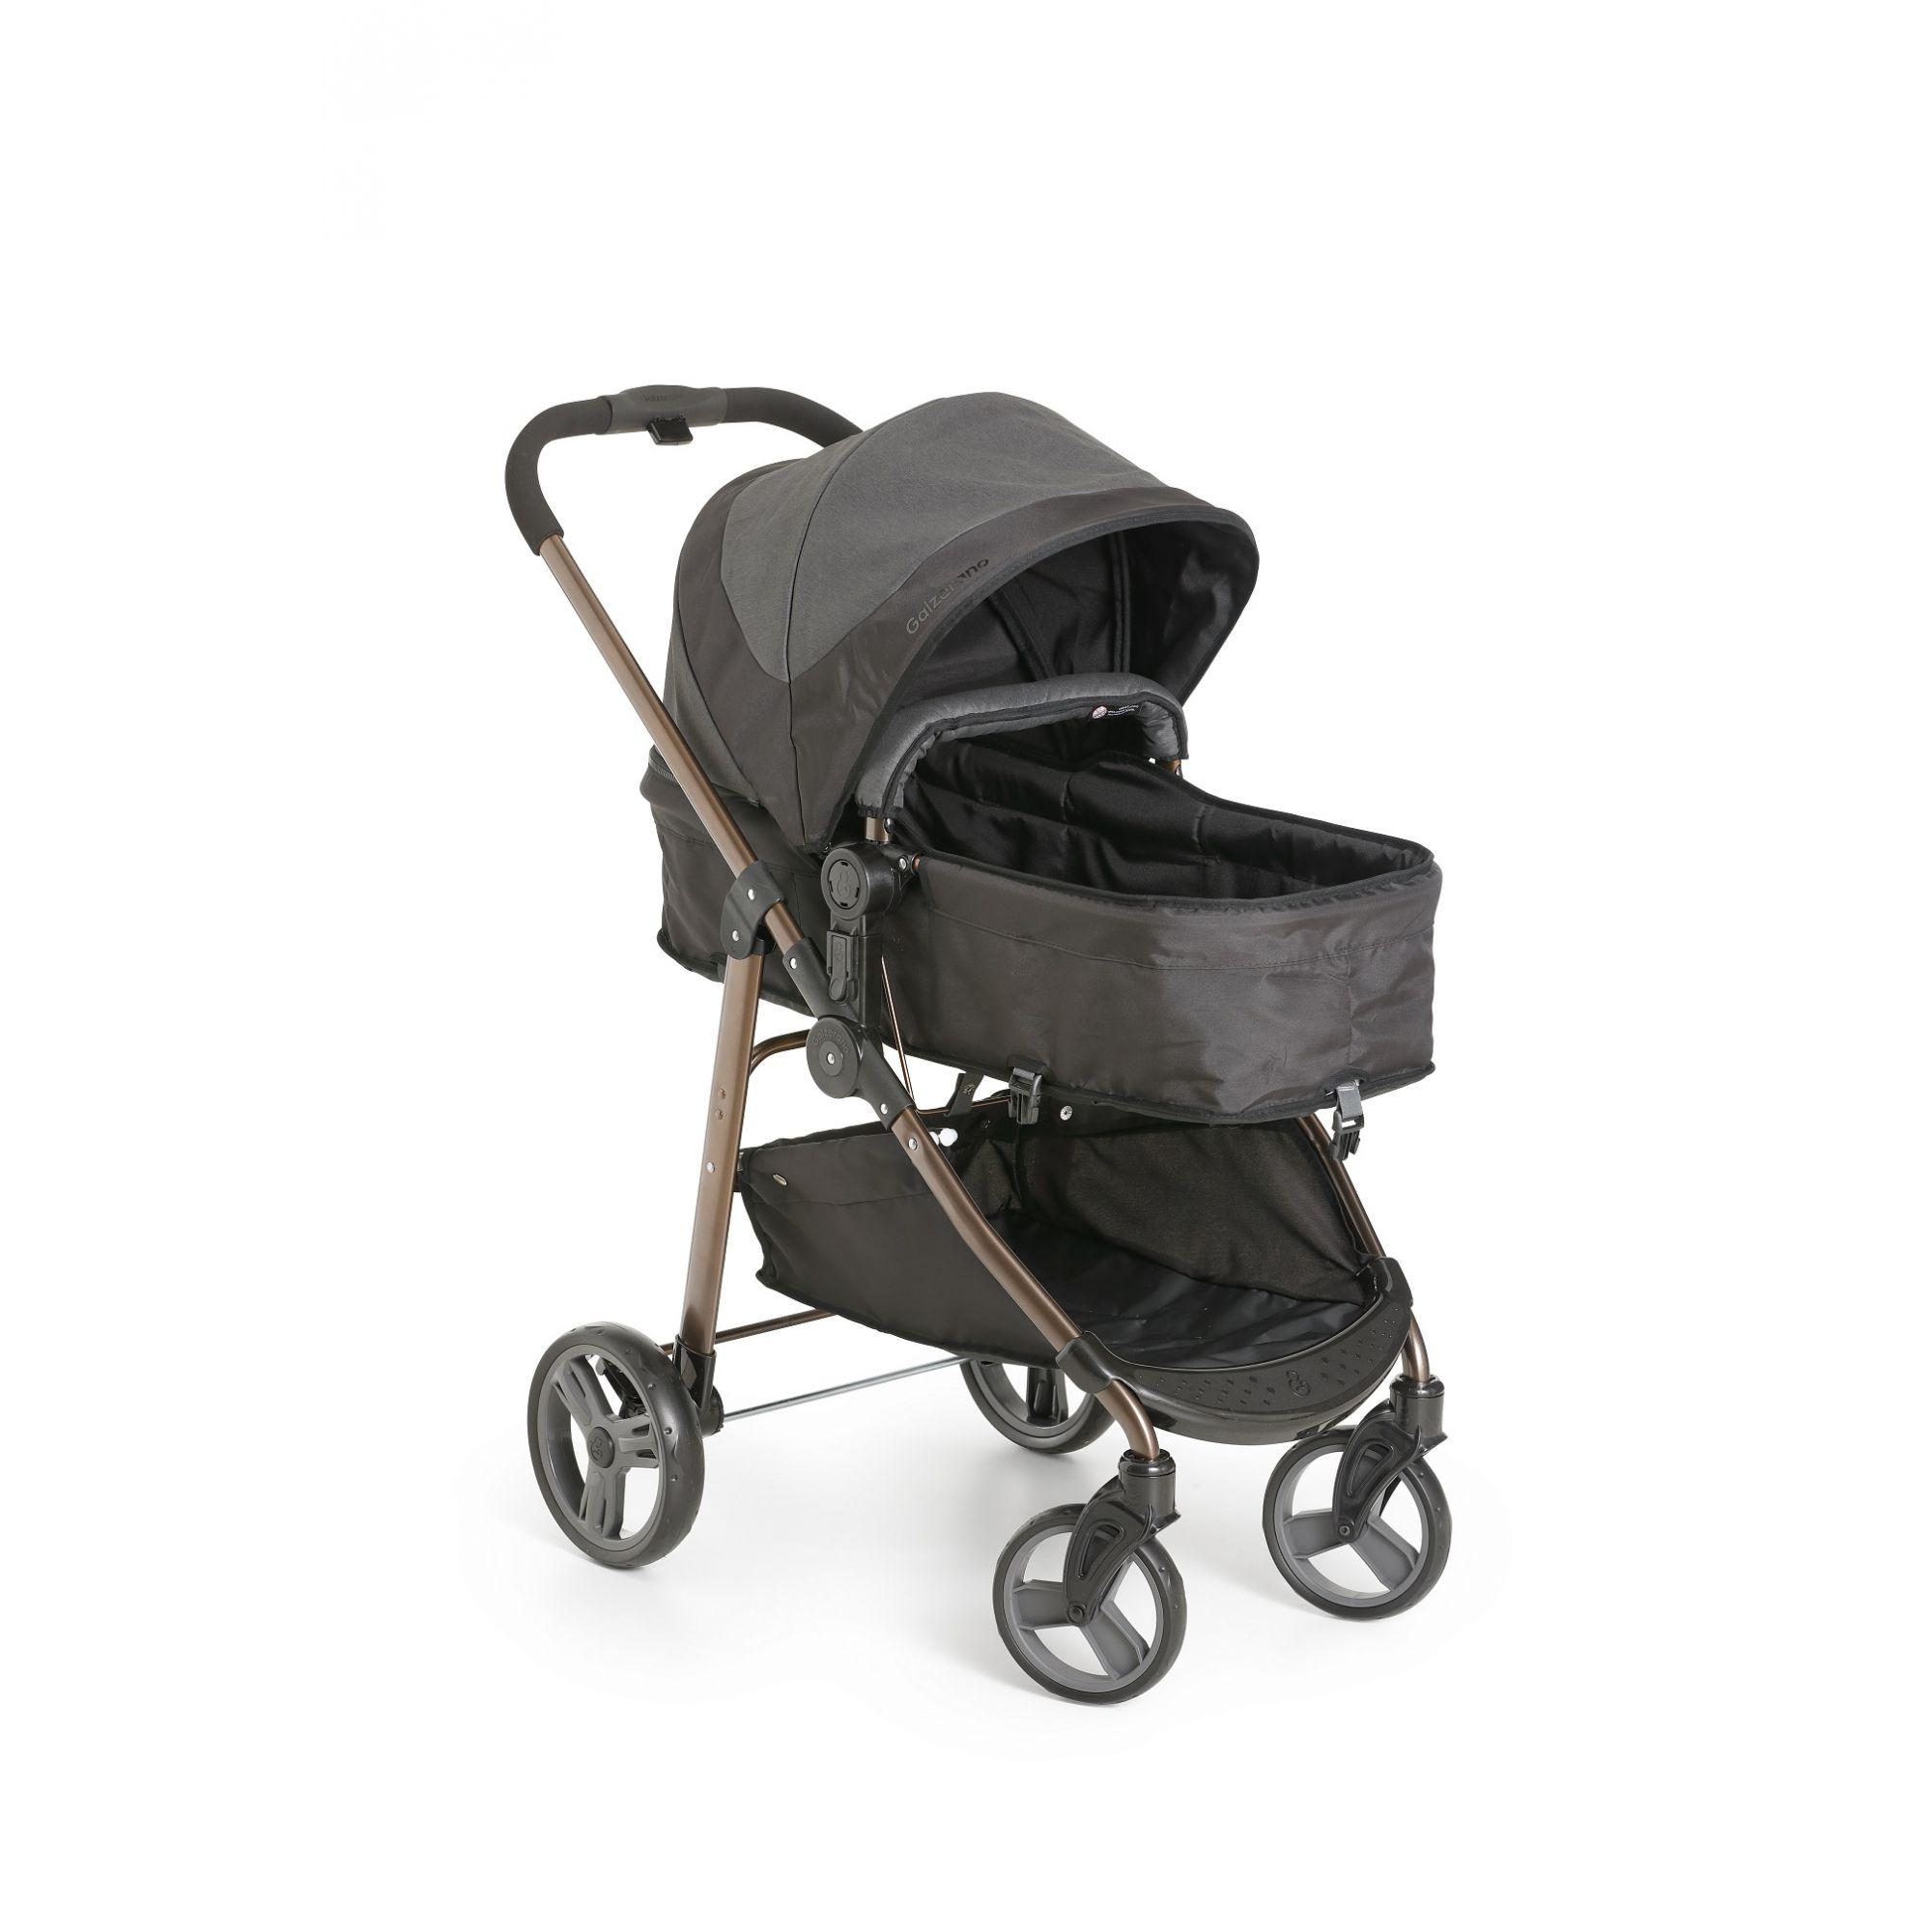 Carrinho de Bebê  Moisés Olympus Black - Galzerano